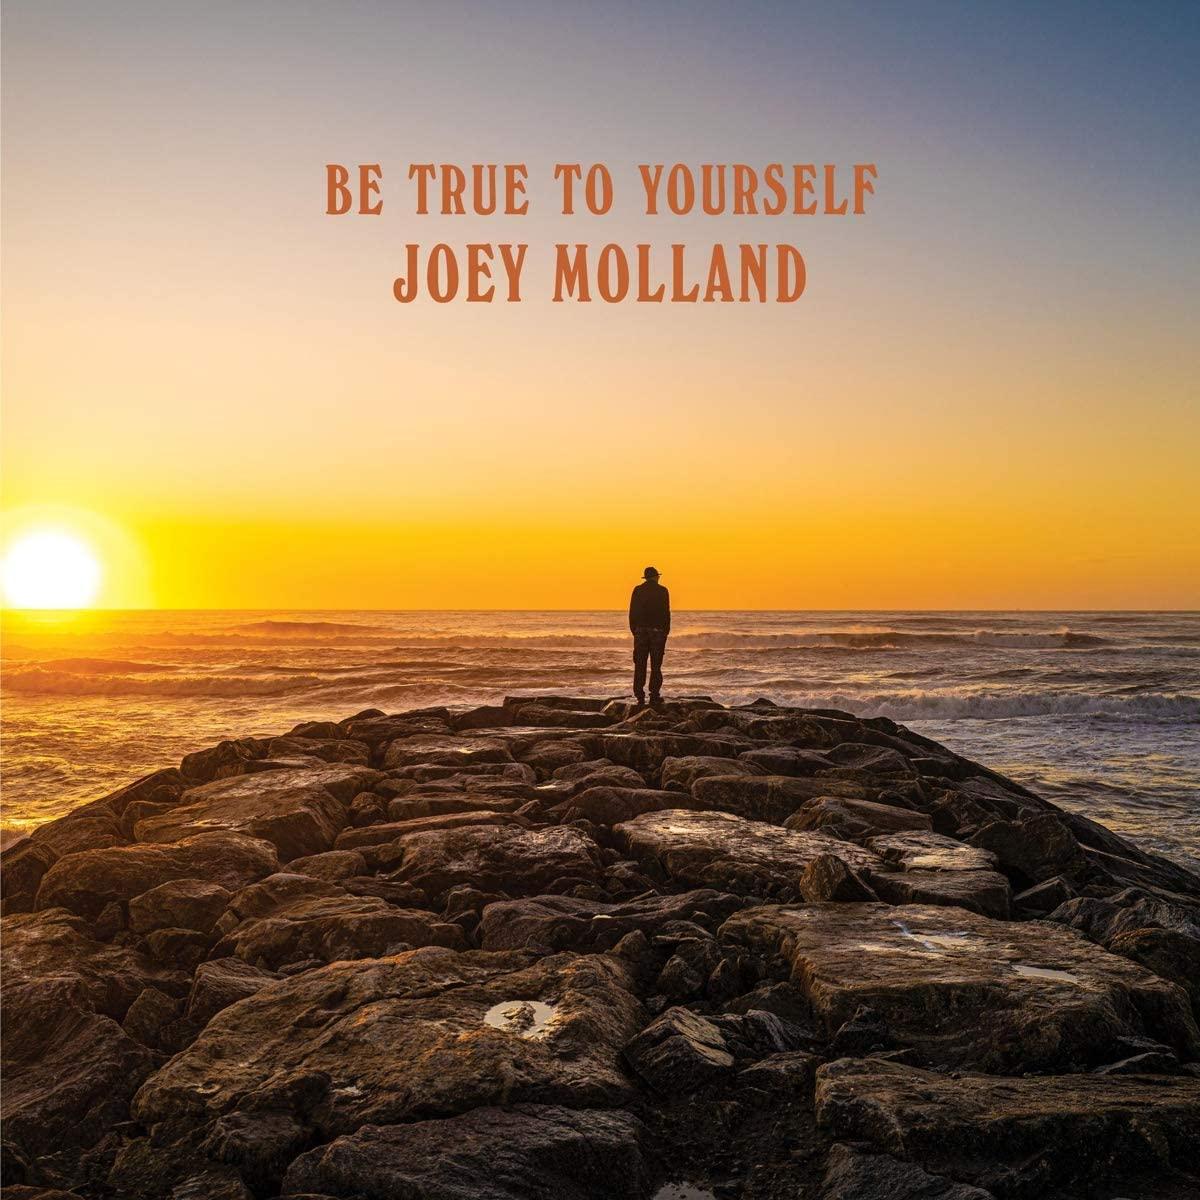 joey molland 2020